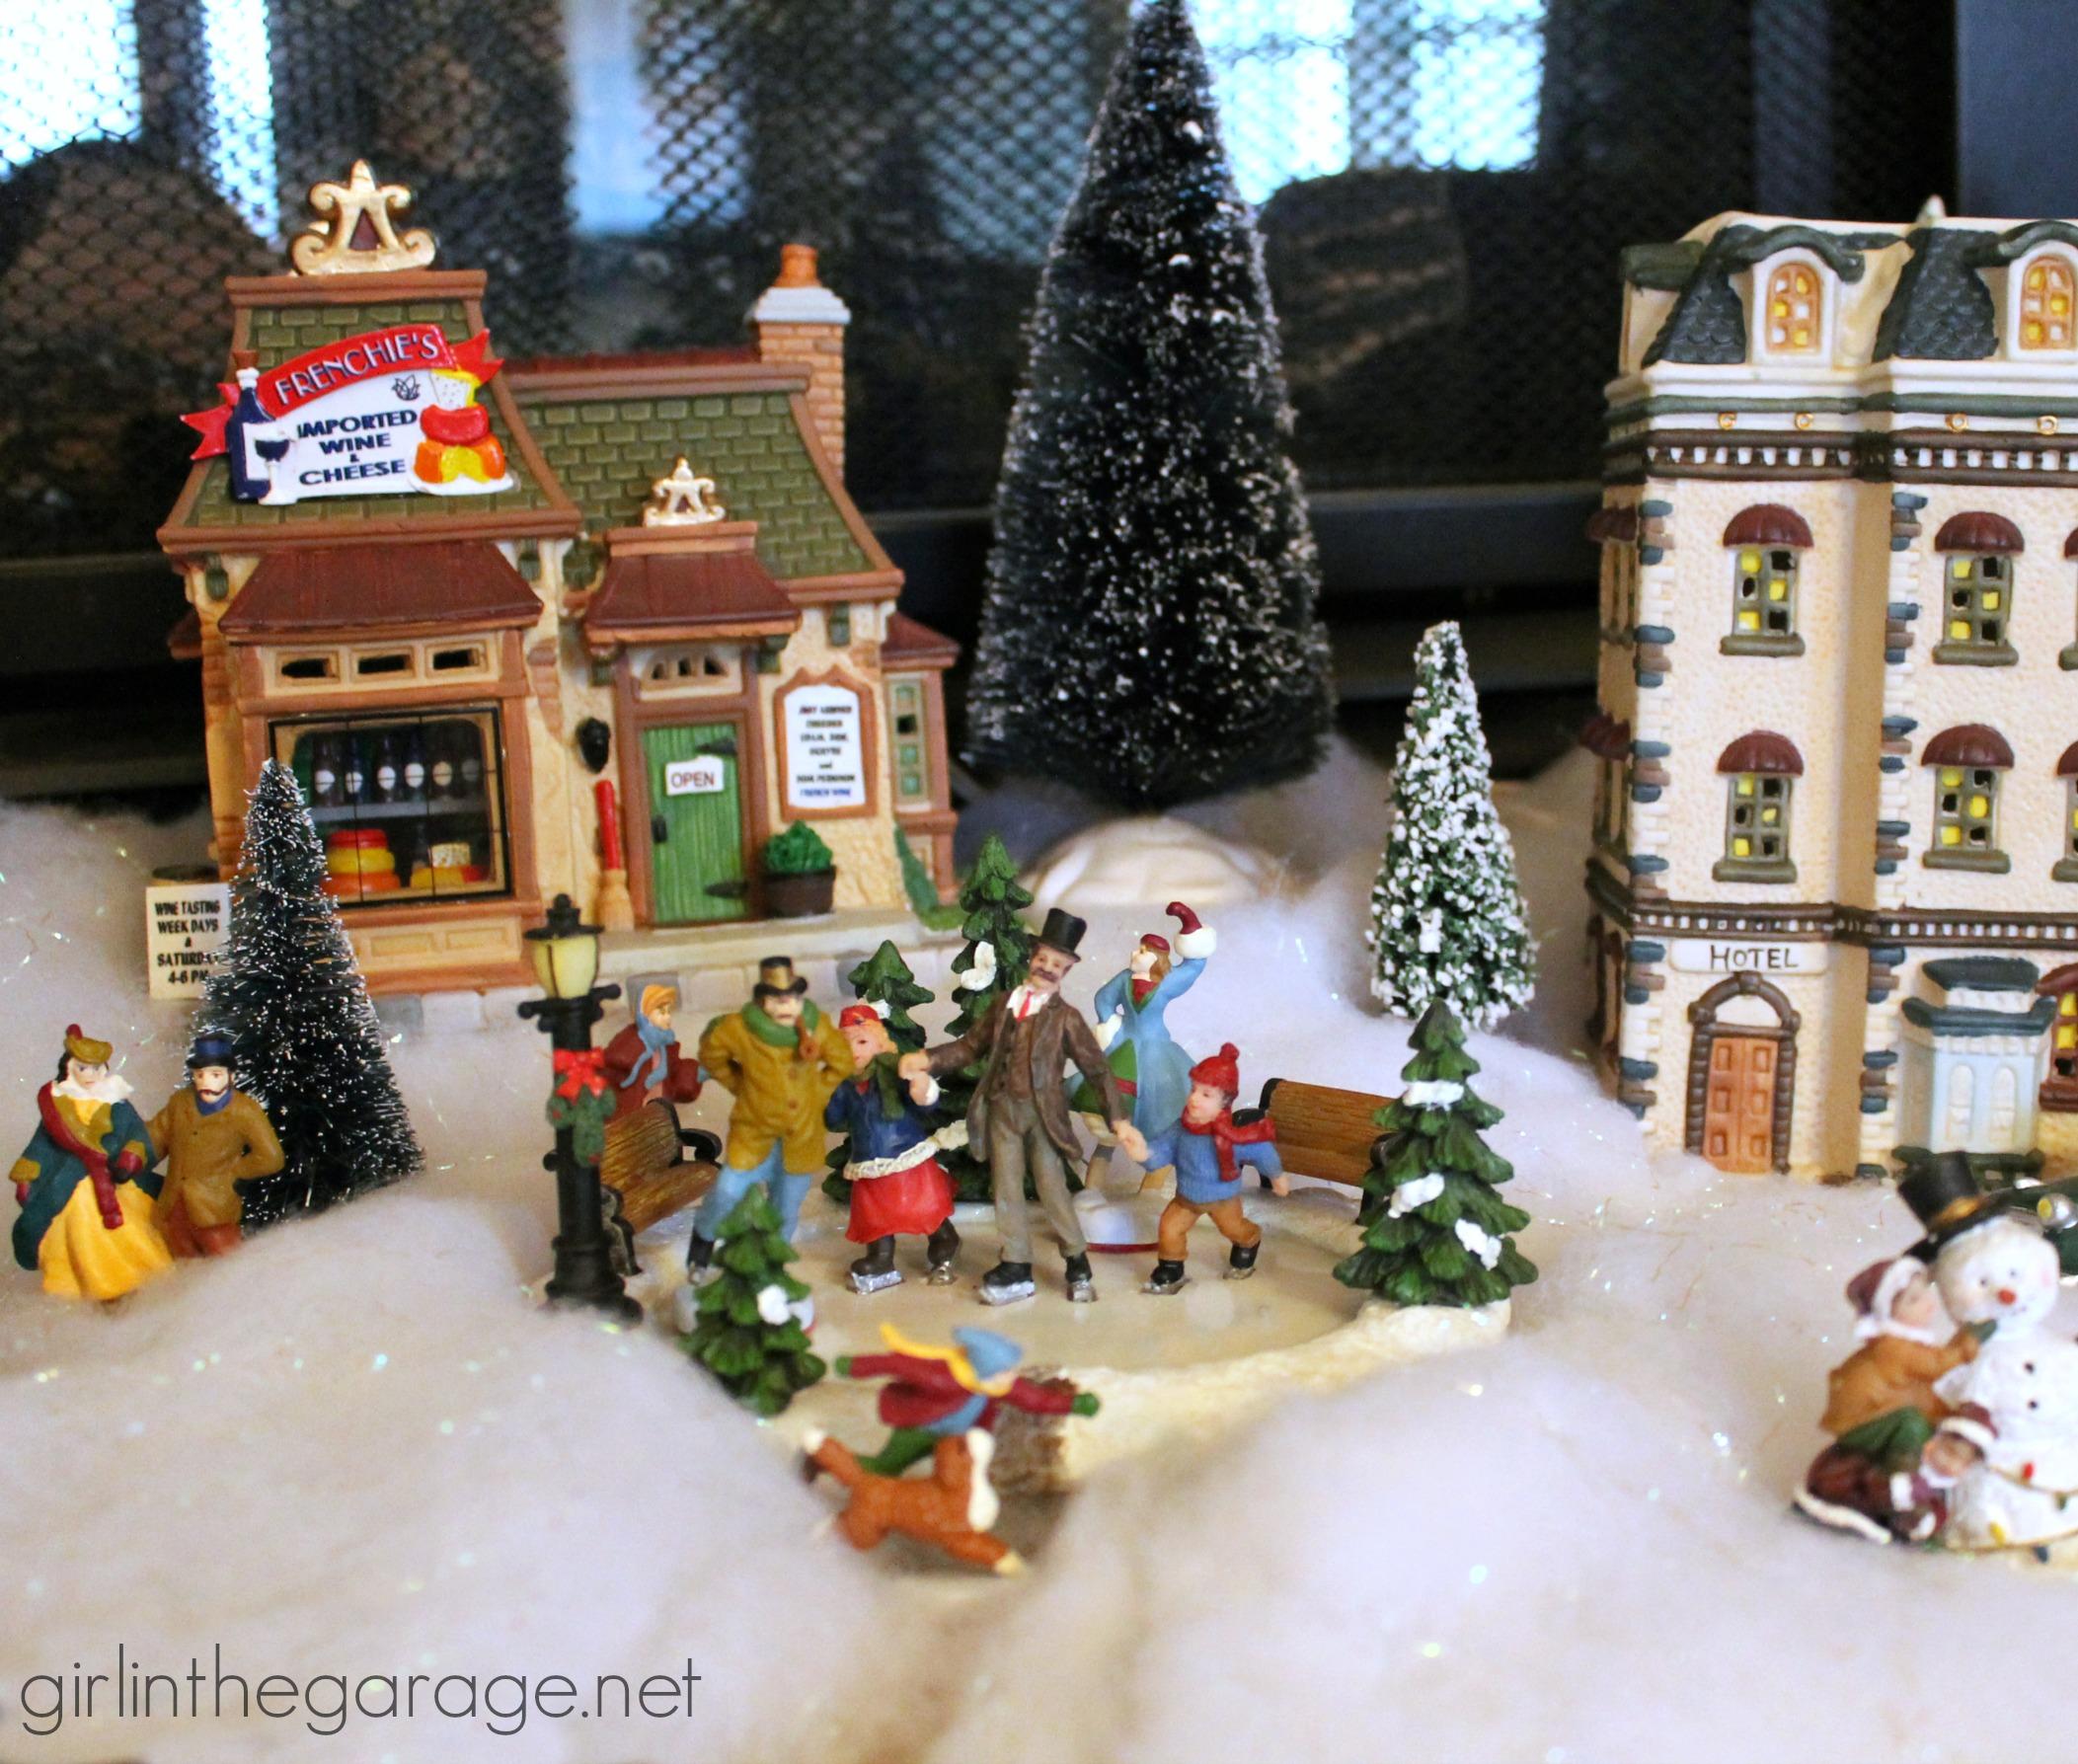 img_4387 christmas village ice skating rink - Christmas Village Ice Skating Rink